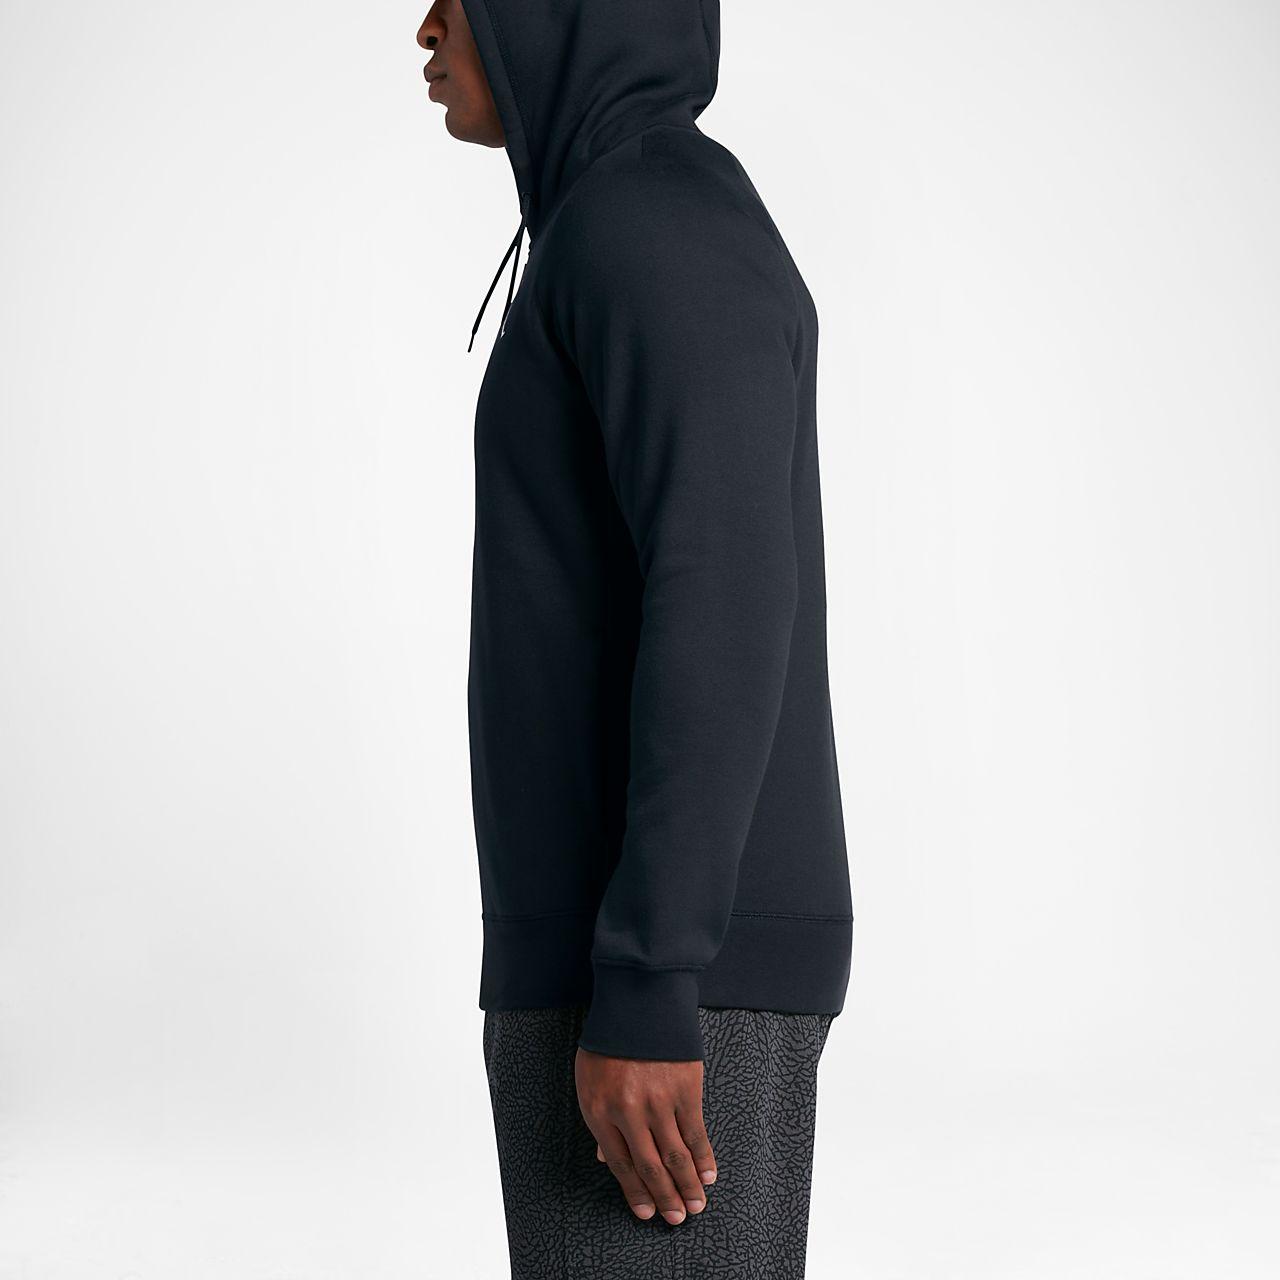 0918774b9c05 Jordan Flight Men s Basketball Full-Zip Hoodie. Nike.com FI